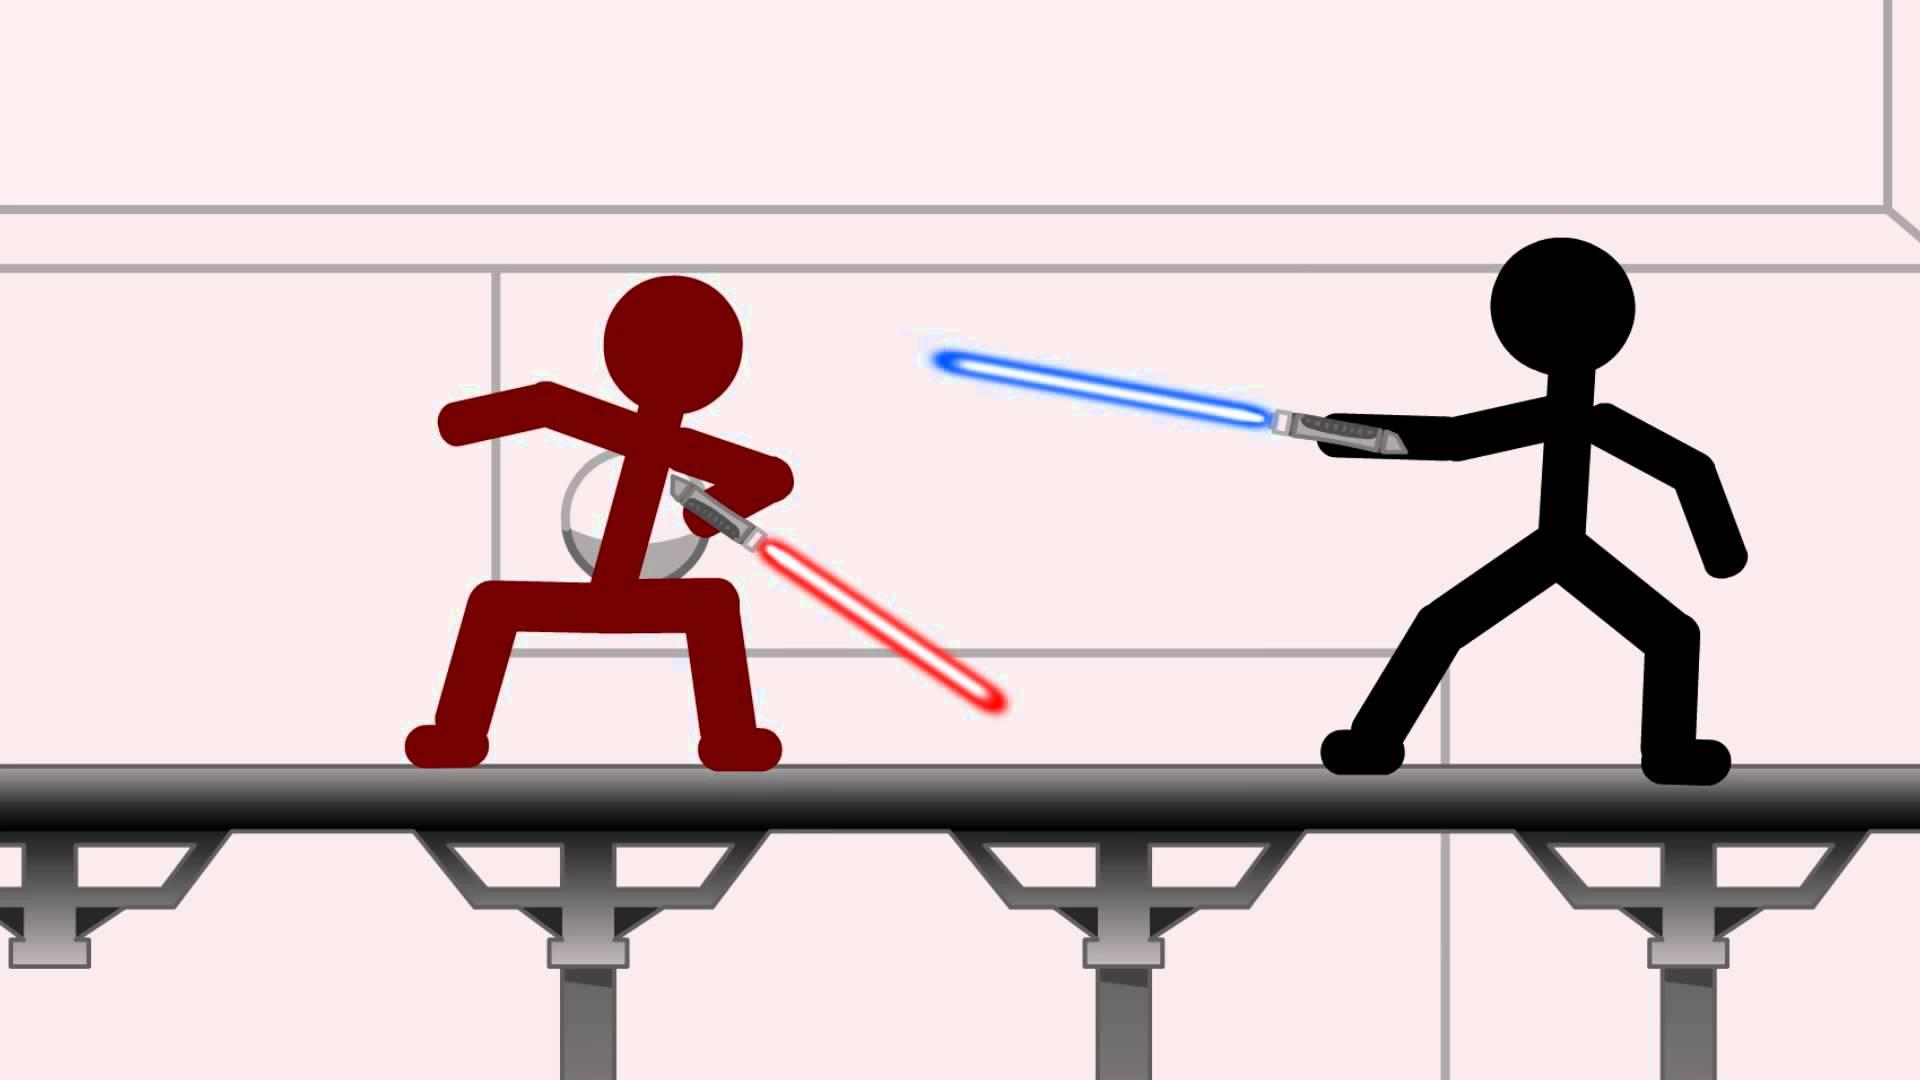 Battle clipart war fighting. Star wars stick figure